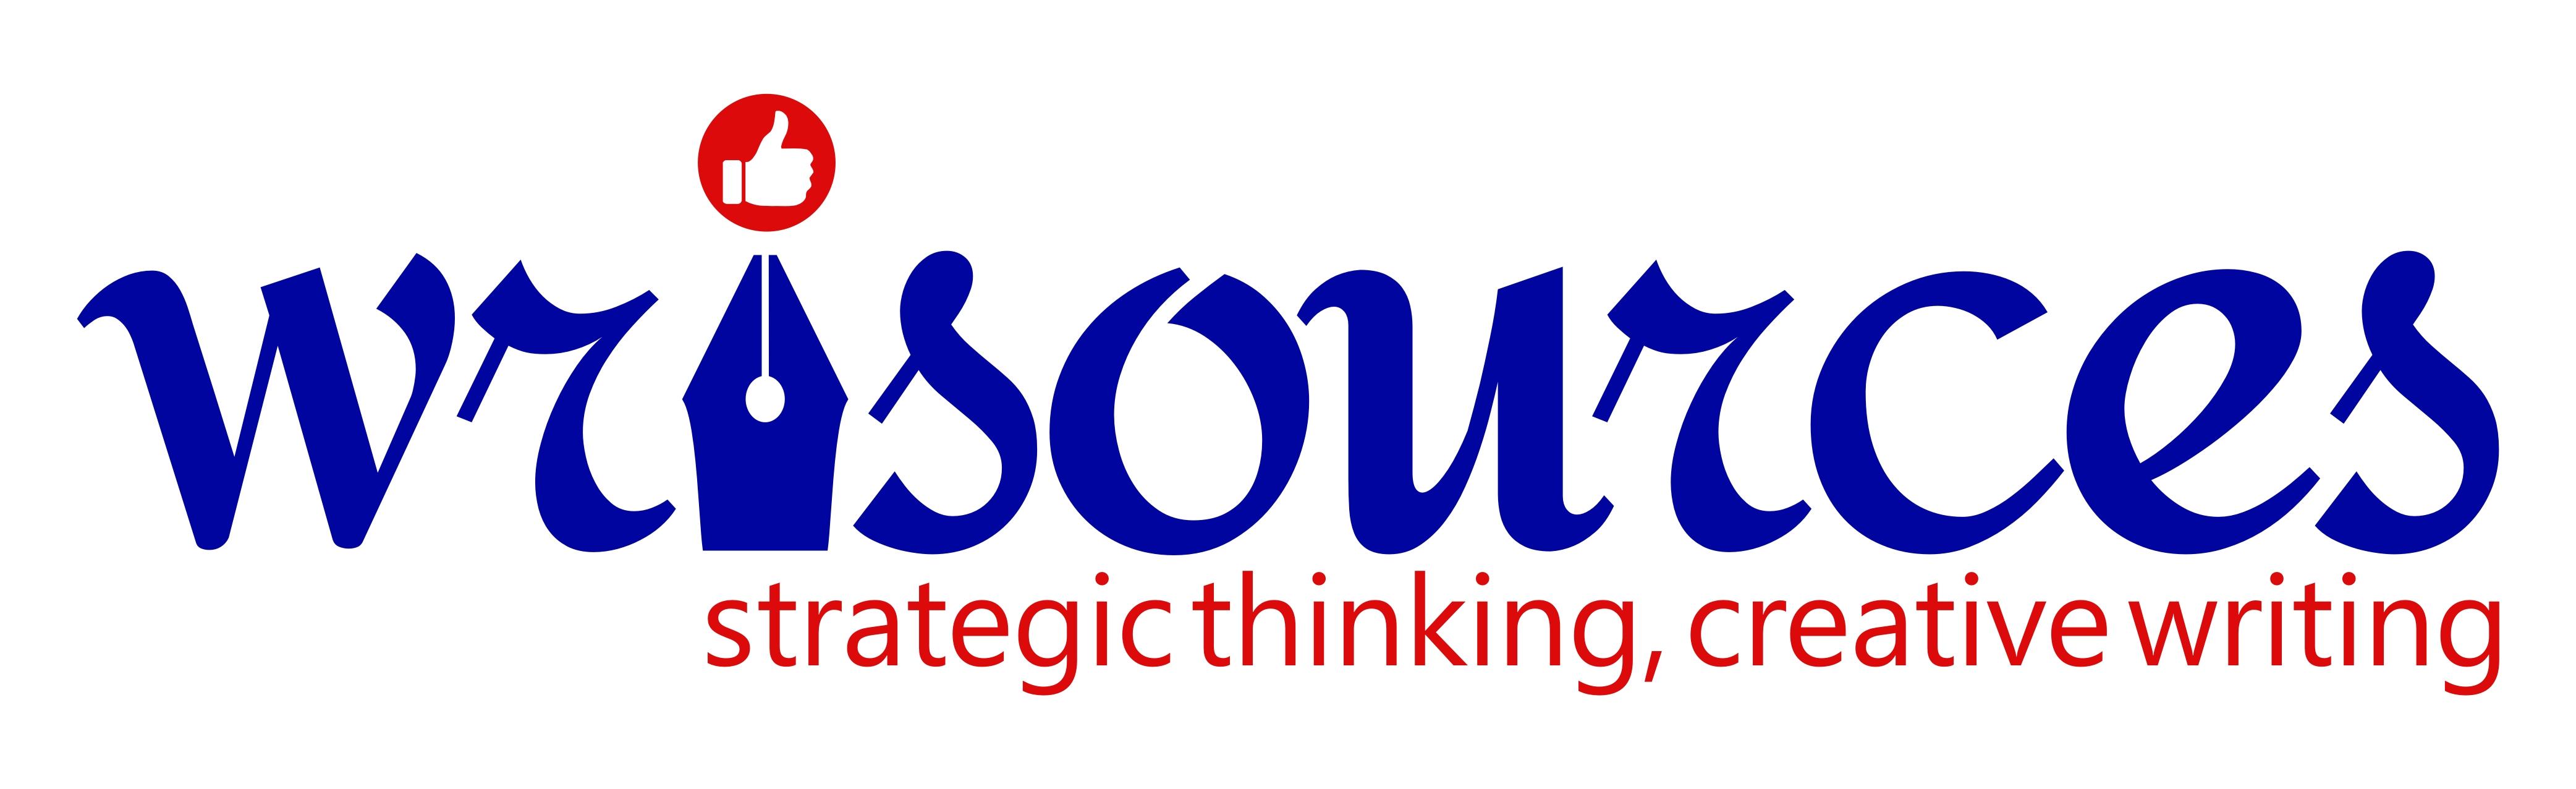 Wrisources logo